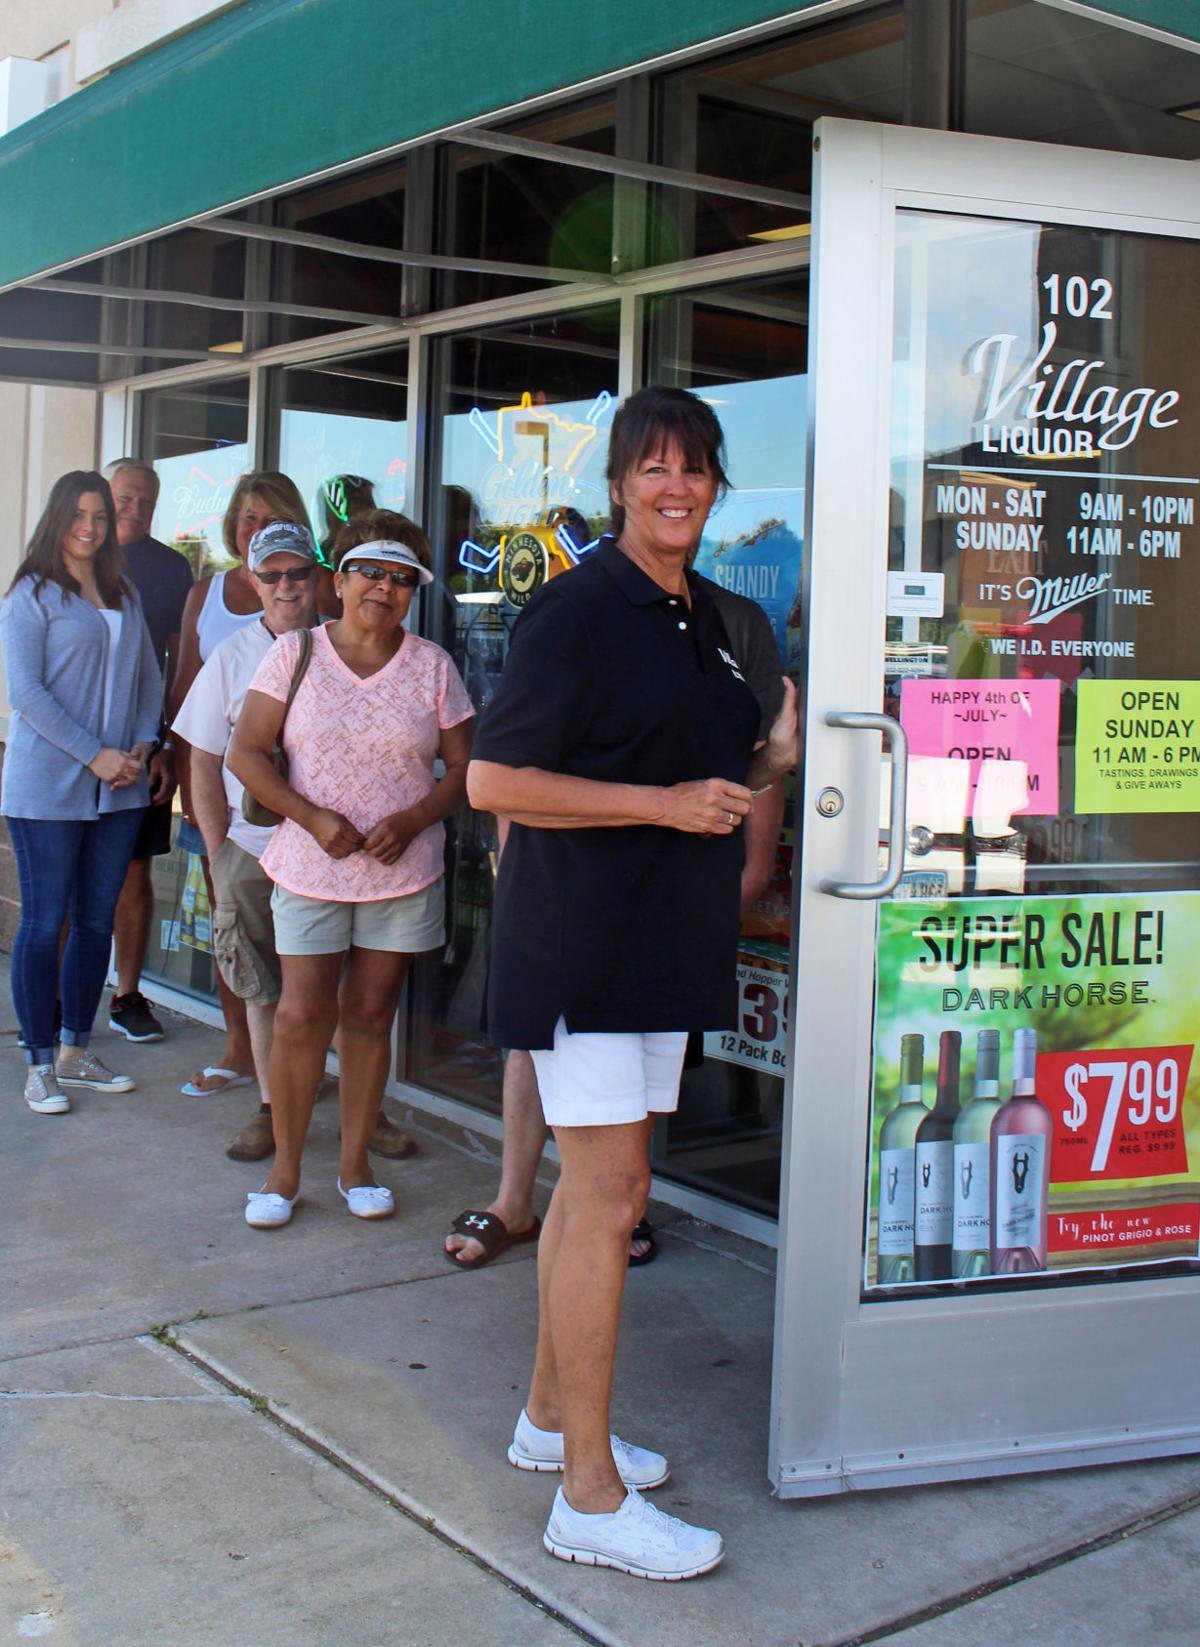 Customers stores embrace Sunday liquor sales – Liquor Sales Rep Jobs